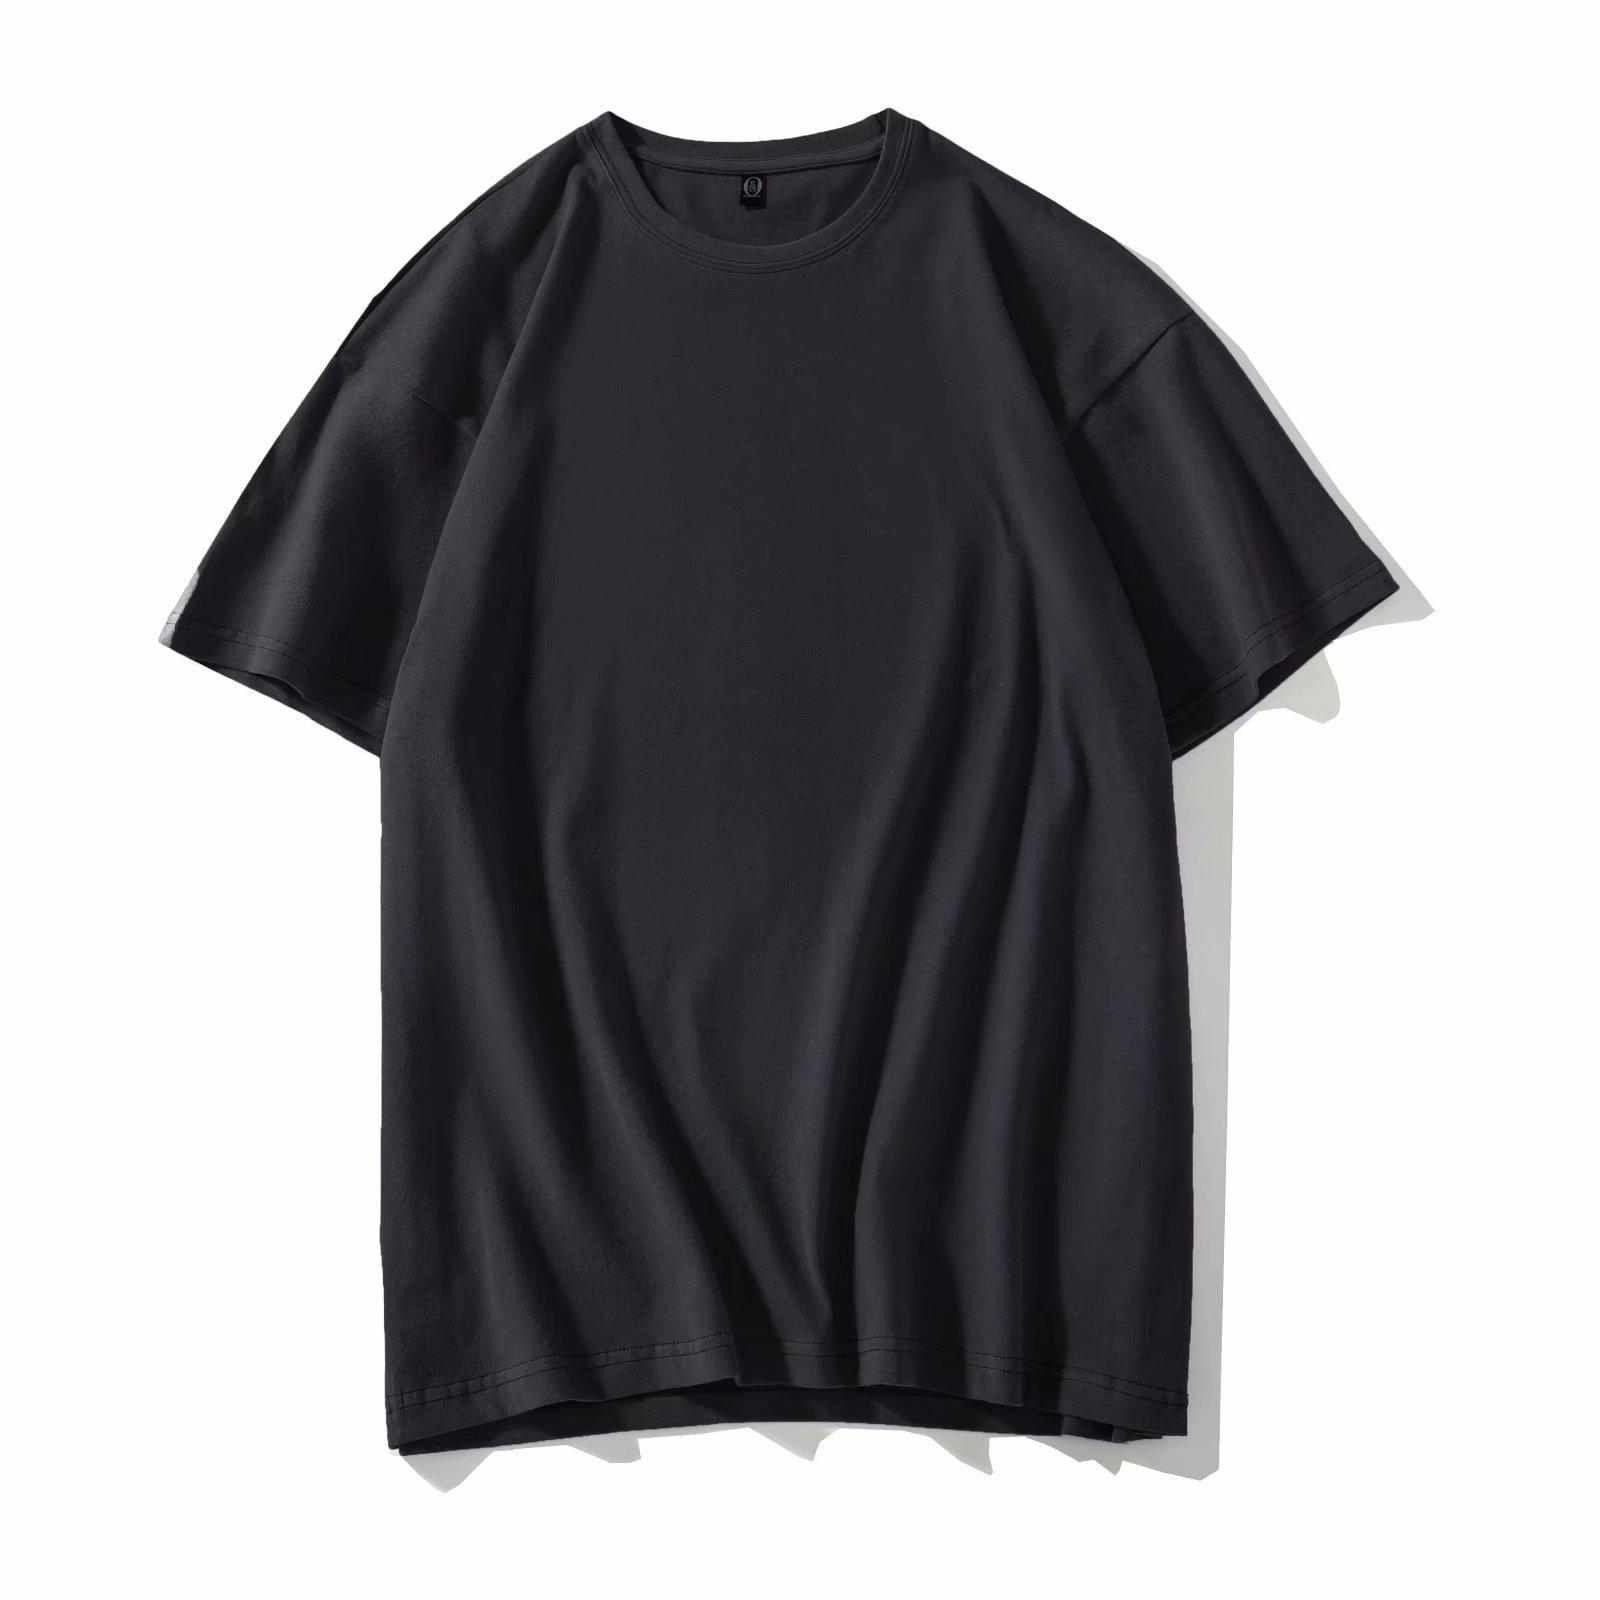 AAA3 BOTTON DROP DROP Spalla a cinque quarti Maniche uomo Soccer Jerseys Camisa de Futebol Da Football Maillot Futbol Uniforme Fútbol Foot Shirts